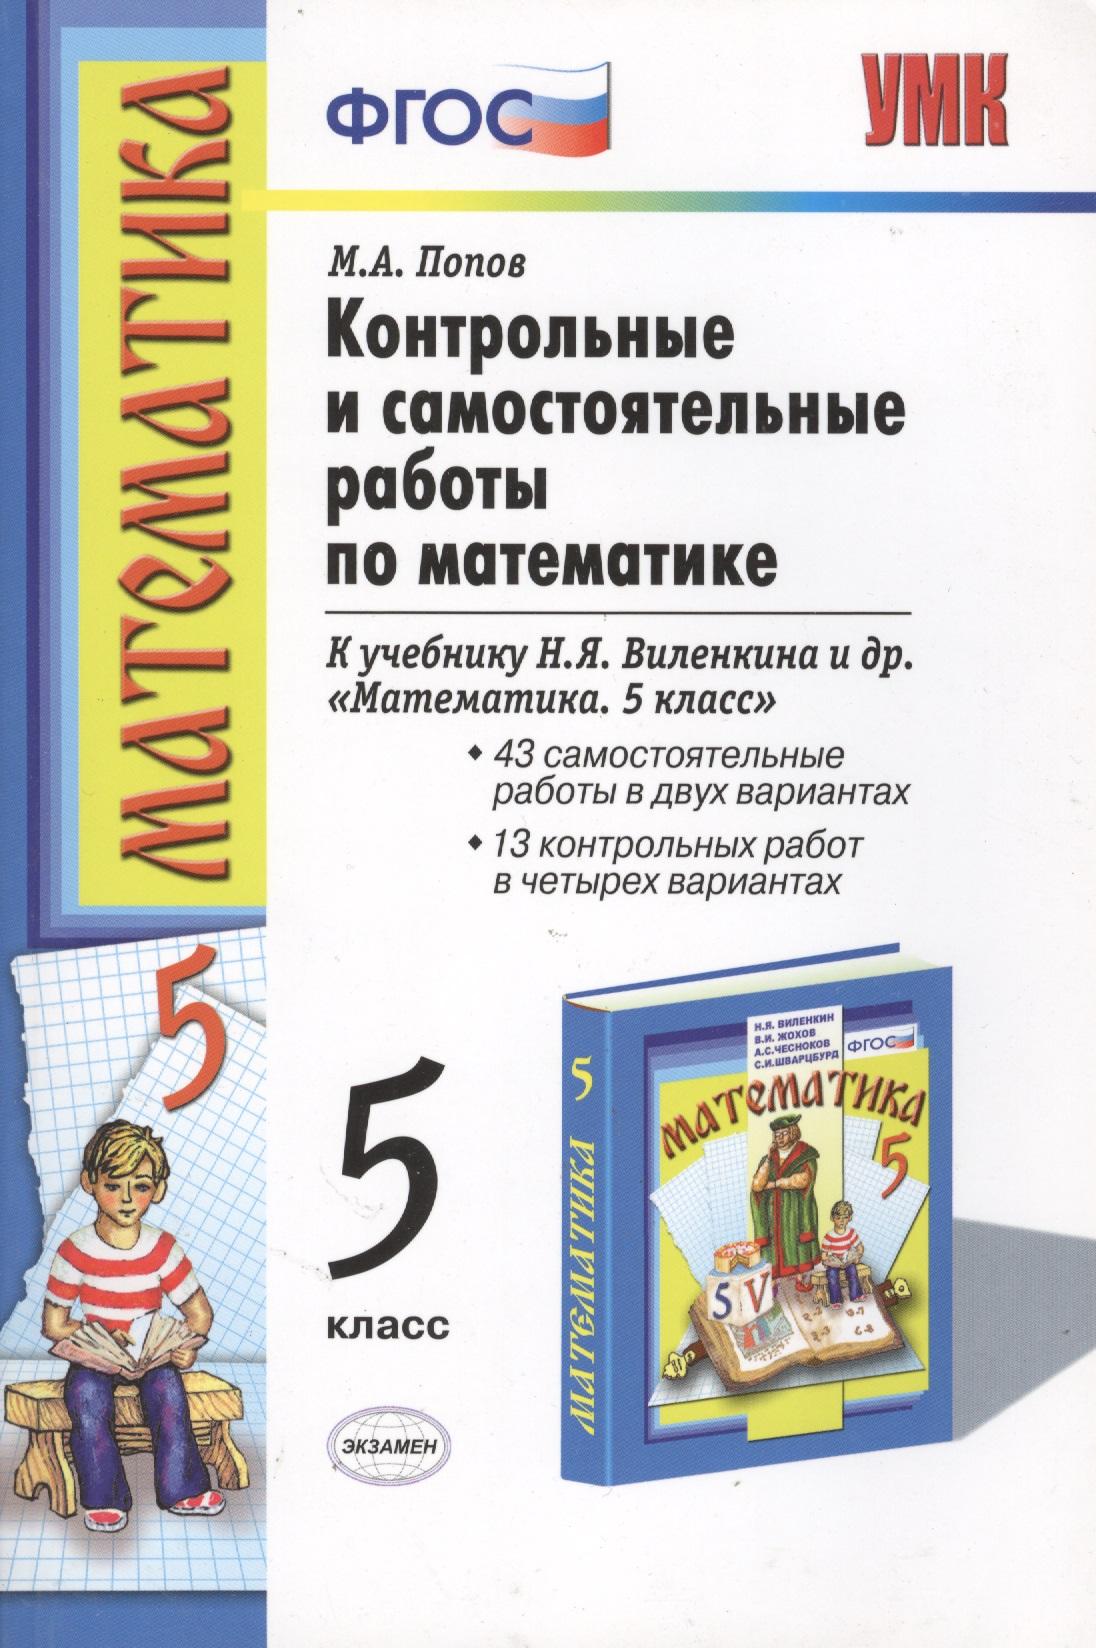 Математика: учебник для 6 класса н.я виленкин и др м.: мнемозина 2002 г